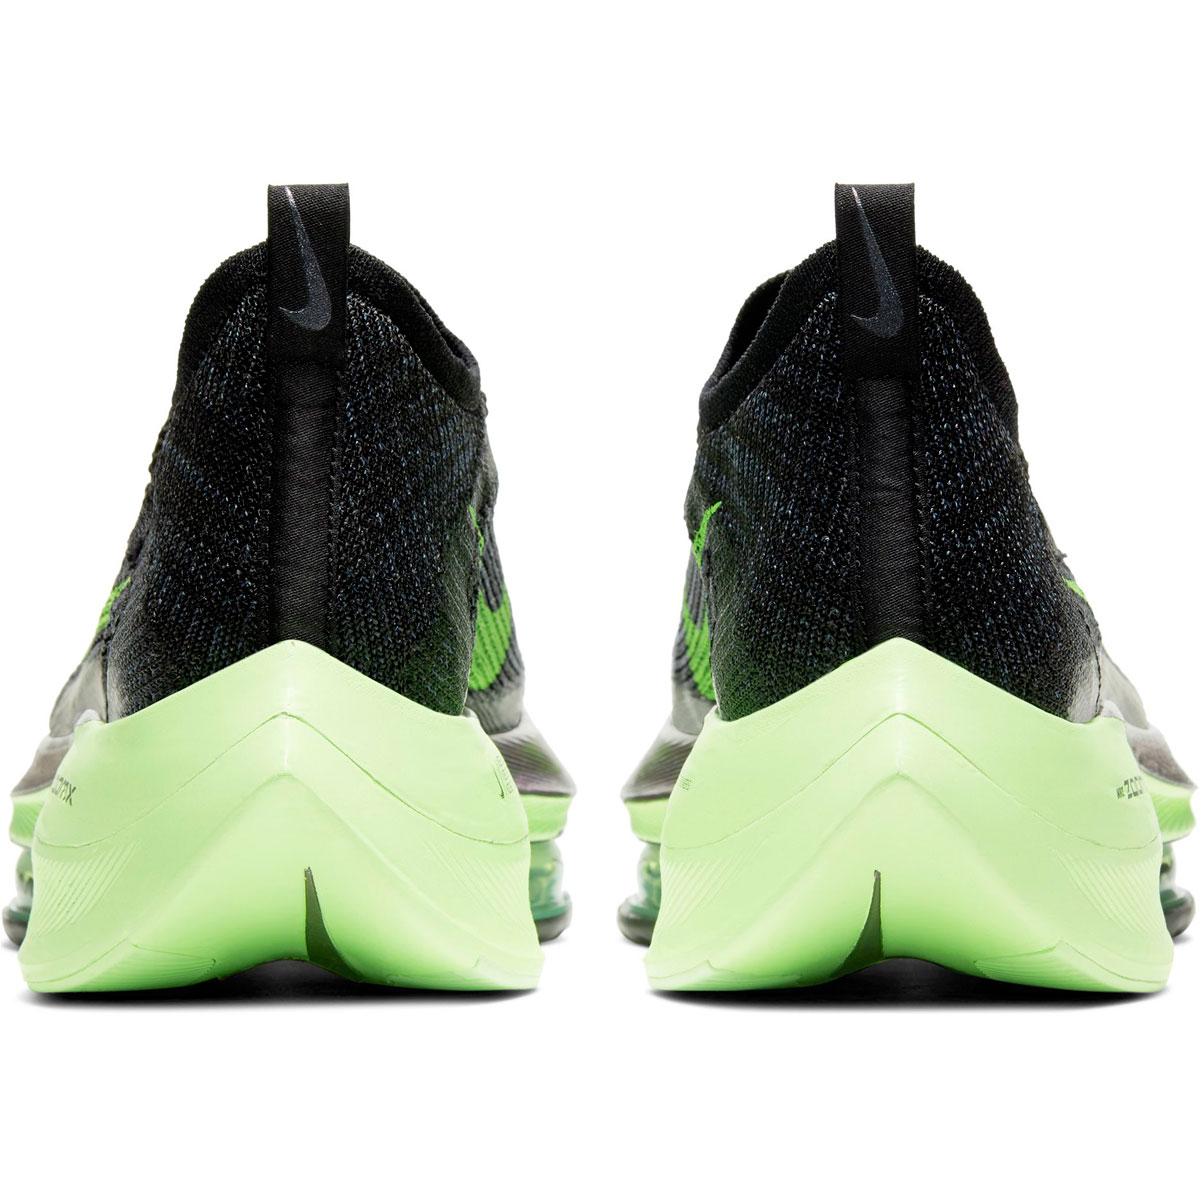 Men's Nike Air Zoom Alphafly Next% Running Shoe - Color: Black/Lime Blast - Size: 6 - Width: Regular, Black/Lime Blast, large, image 5